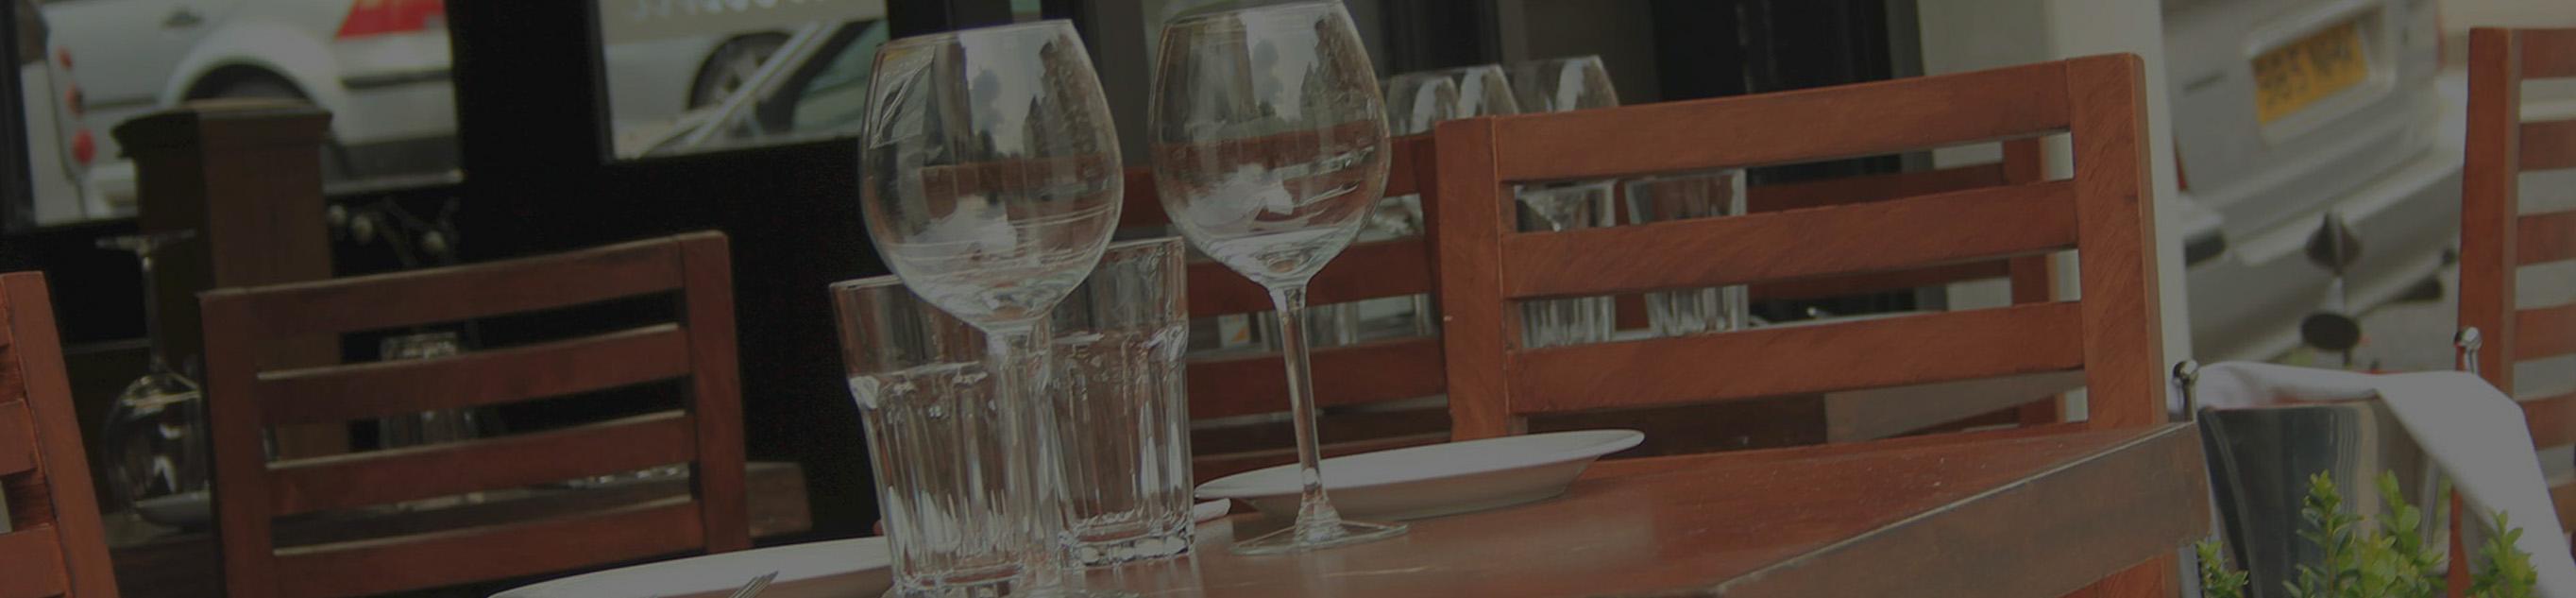 hana-restaurant-030